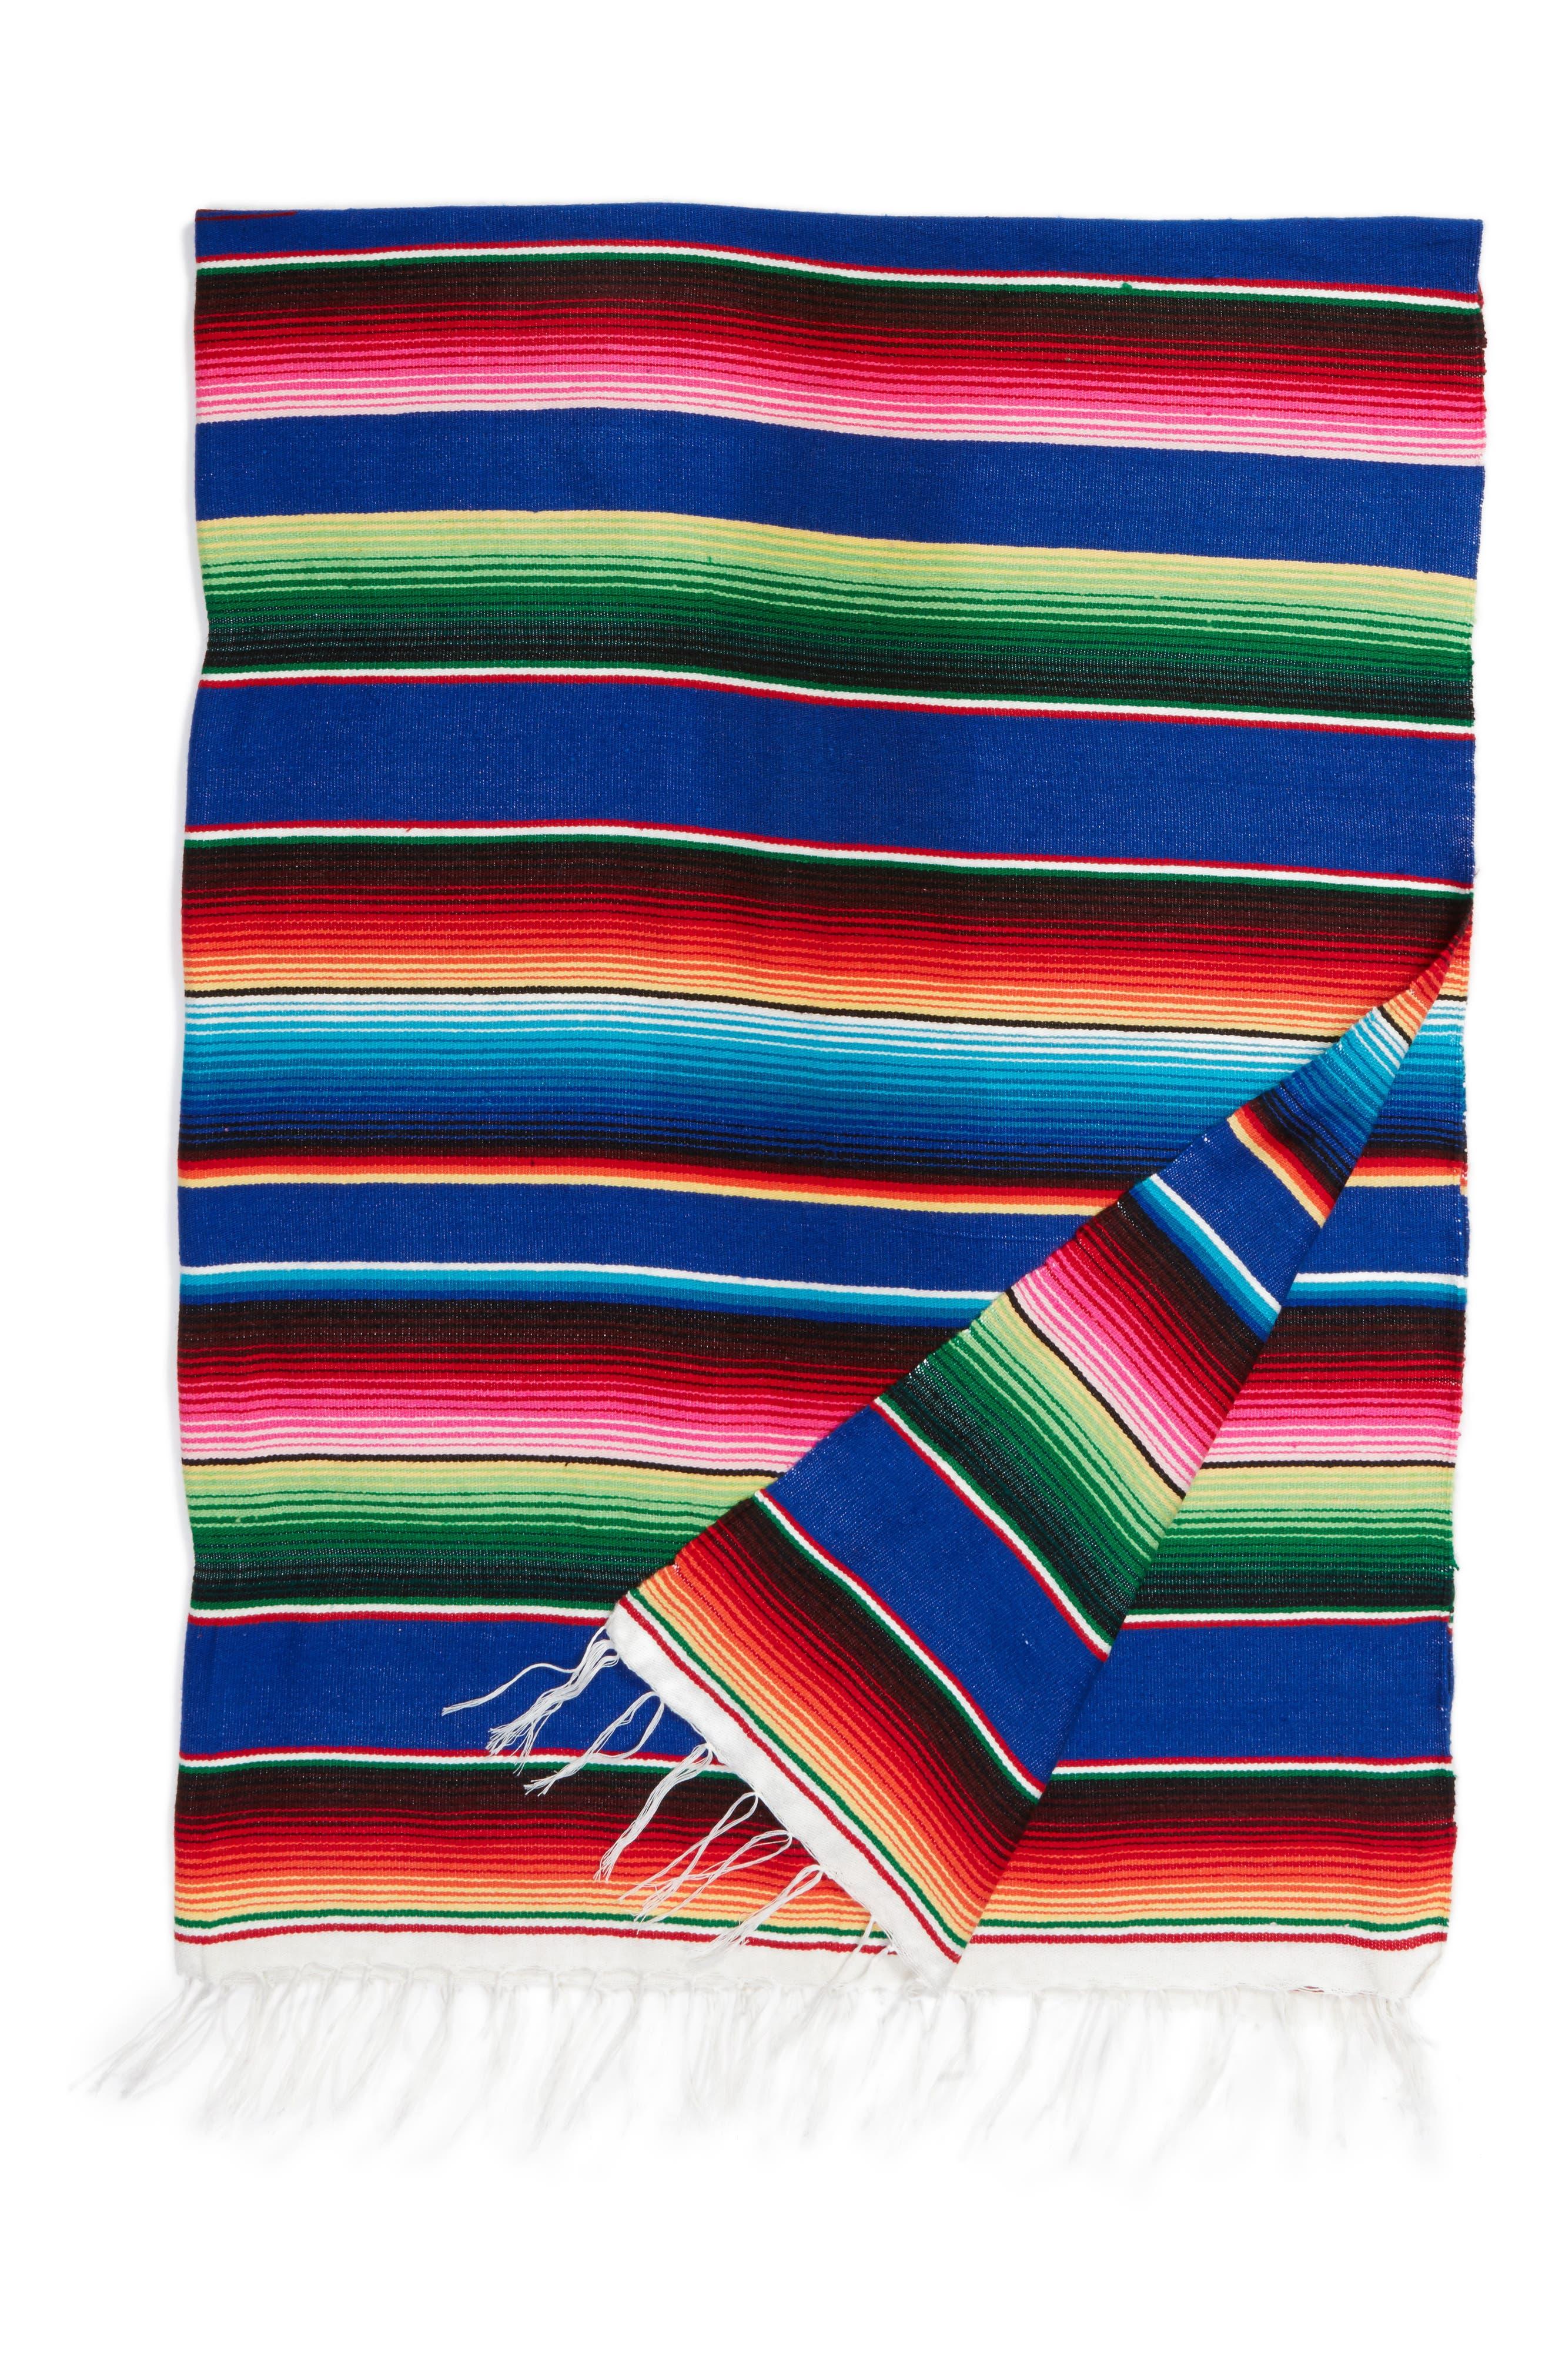 Large Serape Mexican Blanket,                             Main thumbnail 1, color,                             440